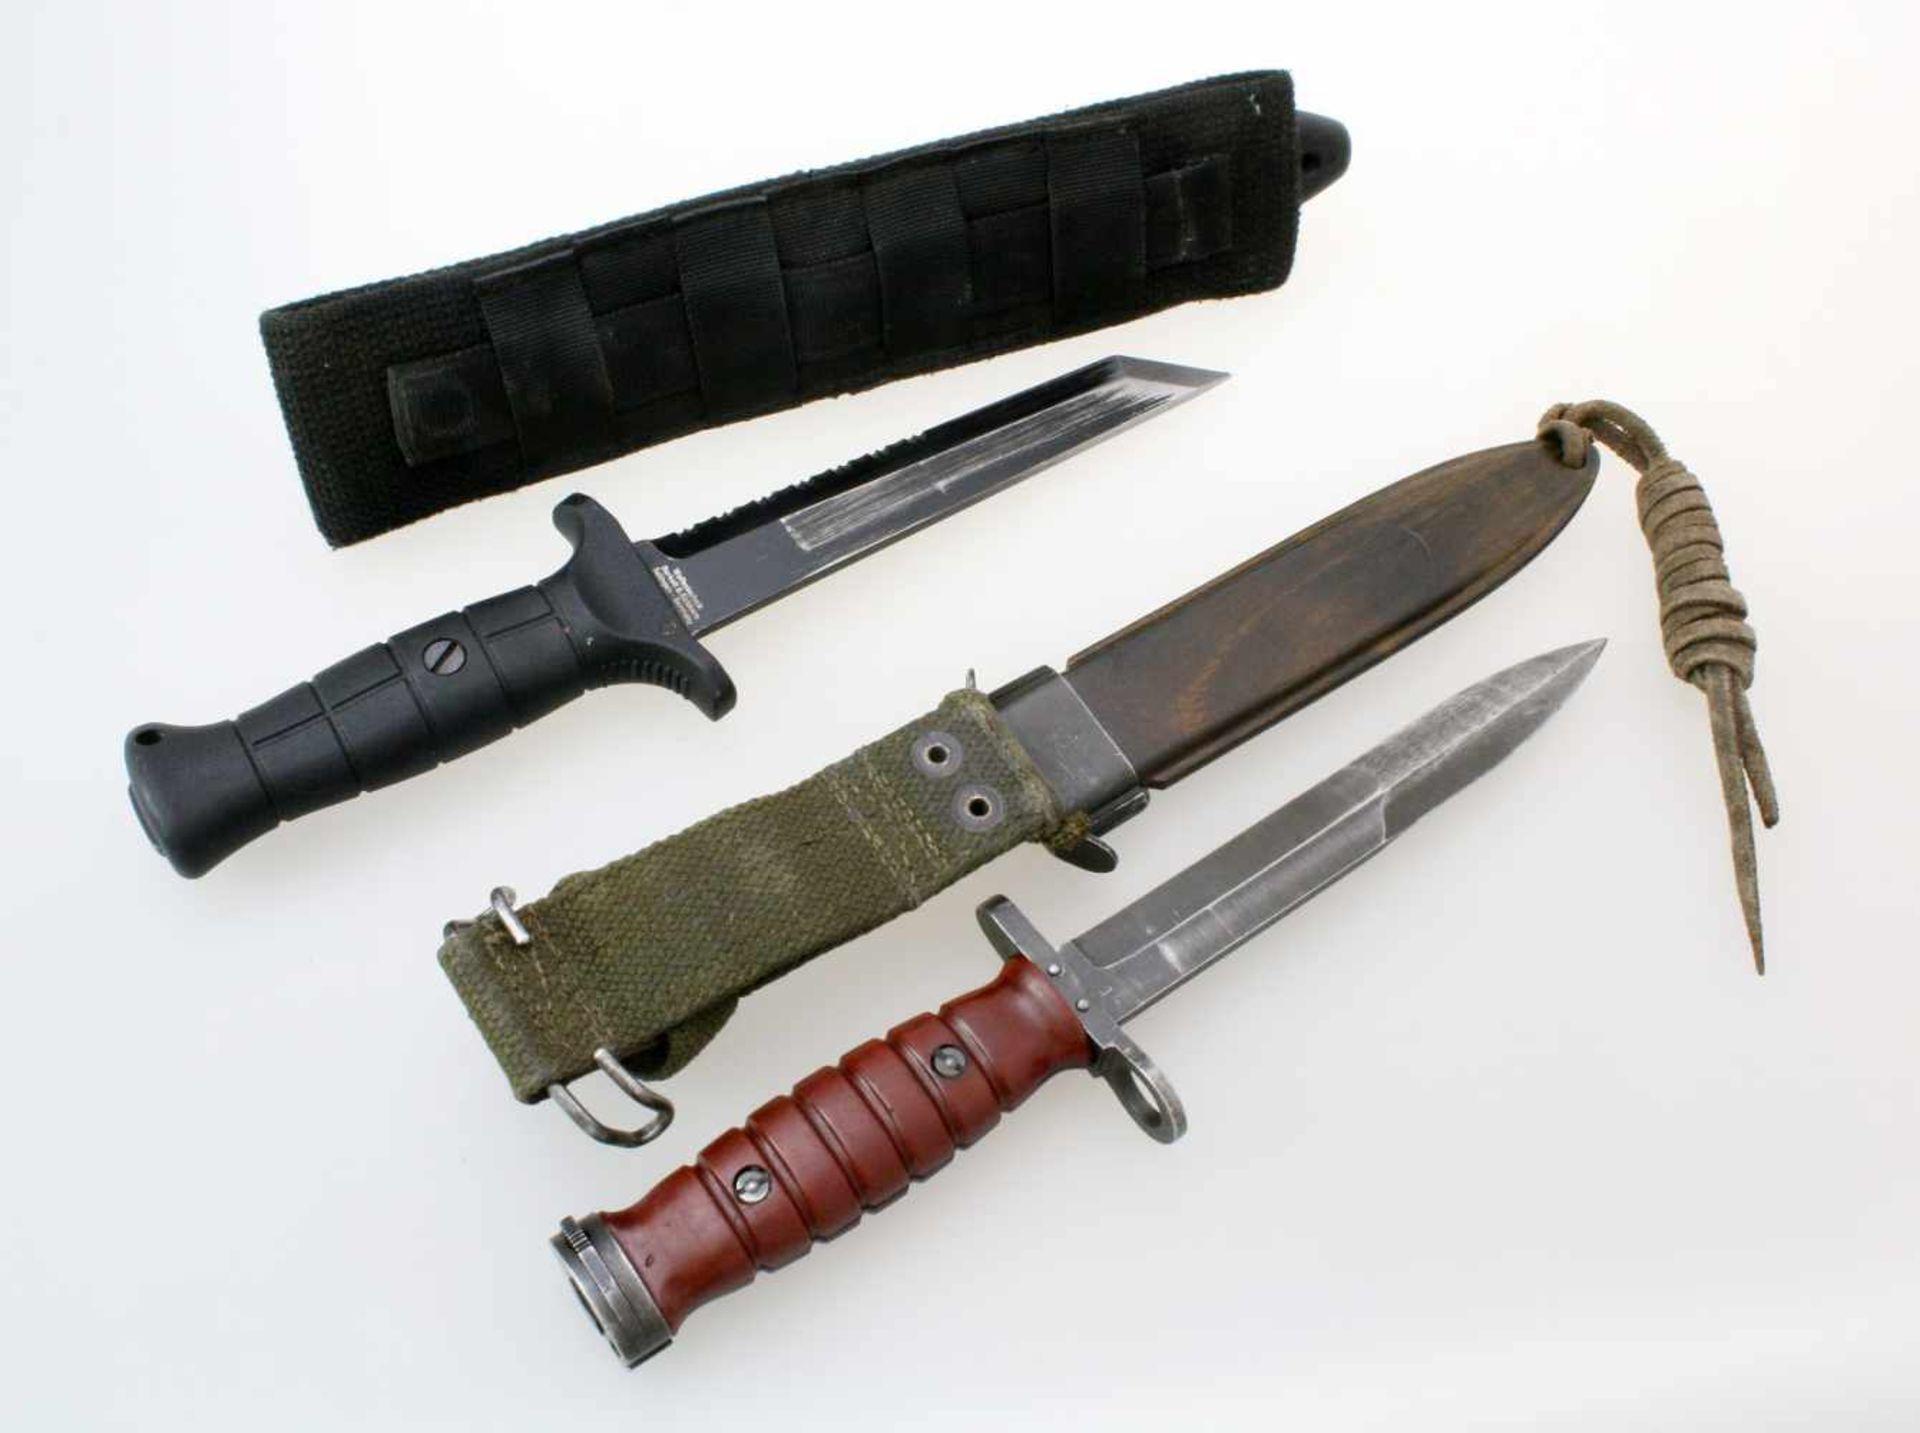 BW Mehrzweckmesser KM2K & Messerbajonett n. Muster M4 zum Carbine M11x BW Mehrzweckmesser KM2K. - Bild 2 aus 2